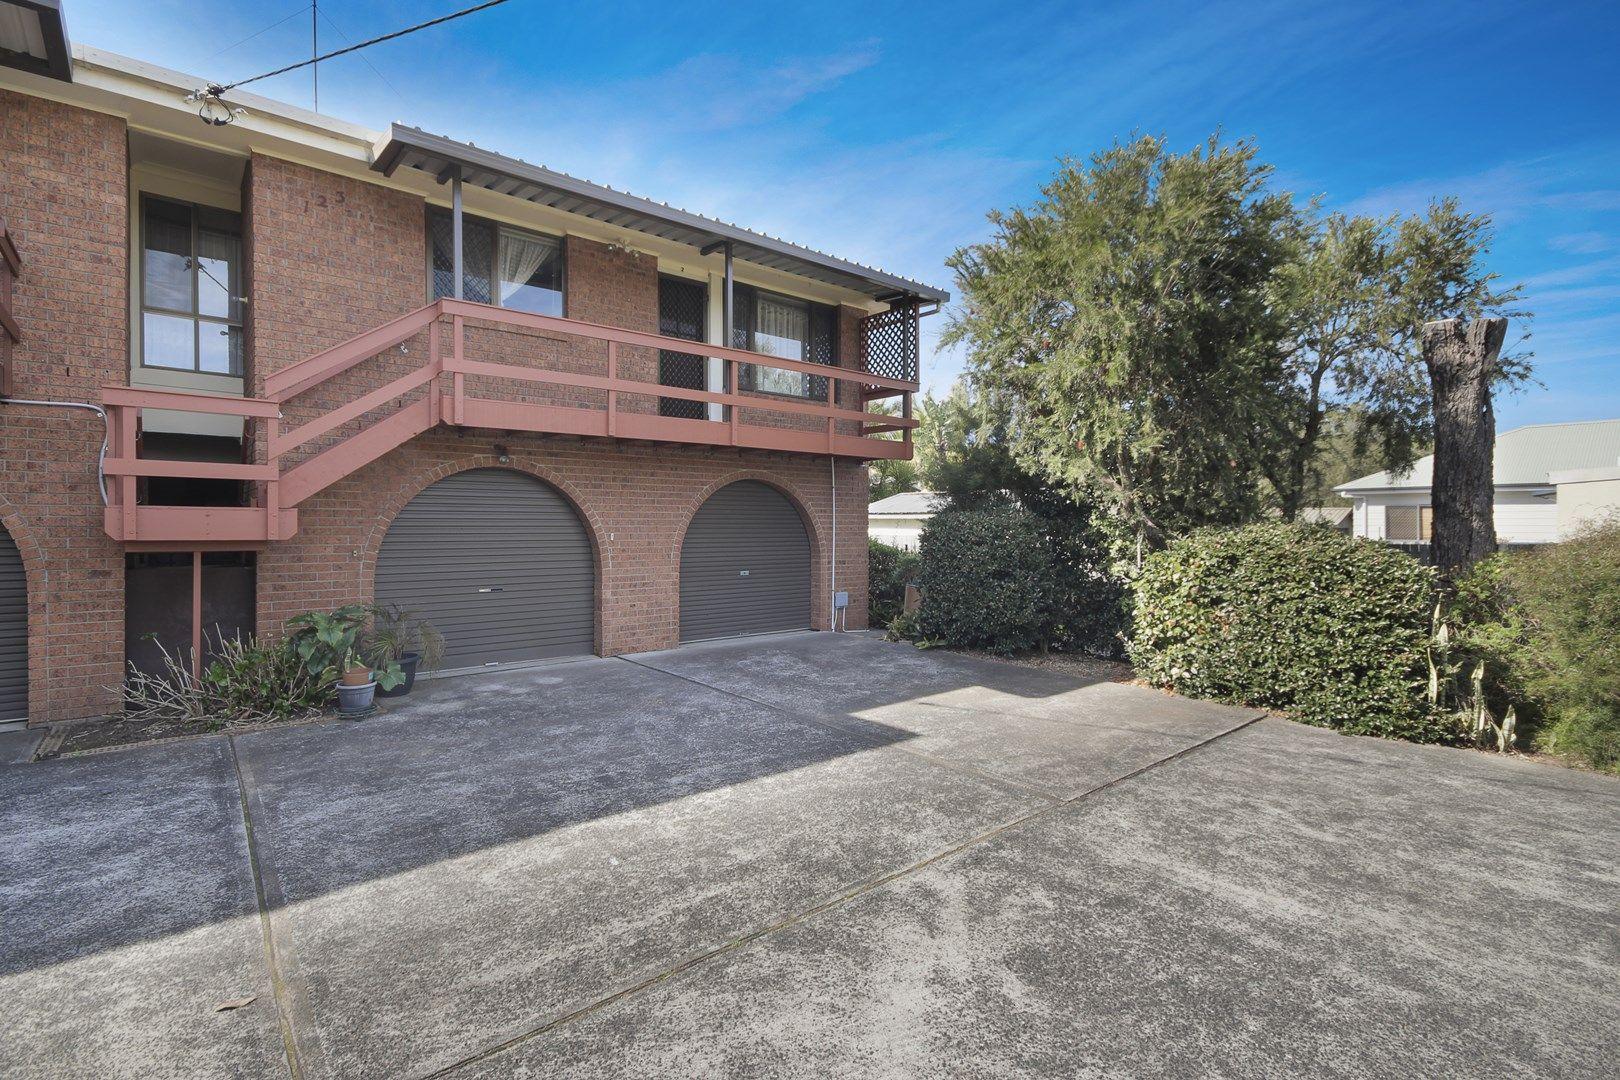 2/123 Kerry Crescent, Berkeley Vale NSW 2261, Image 0